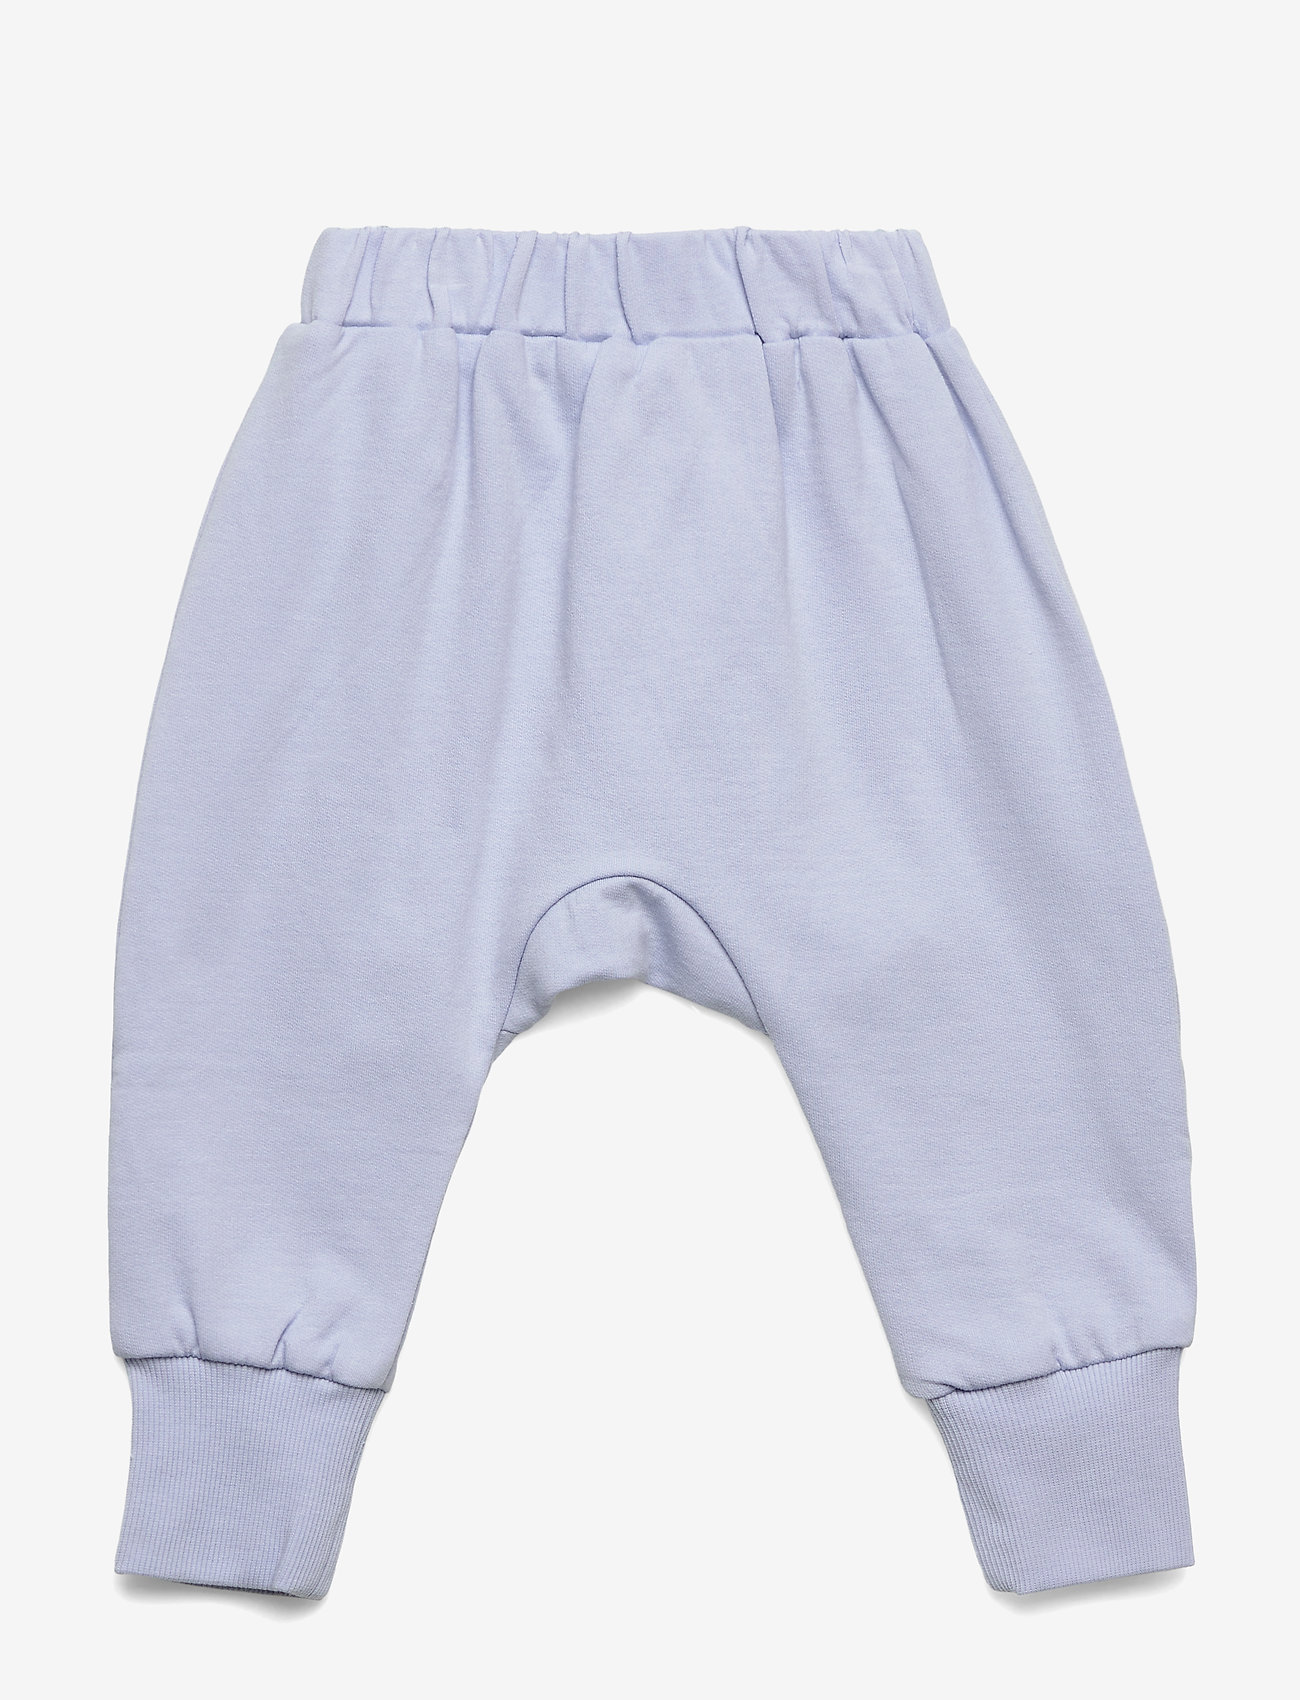 Kenzo - JUN - sweatpants - light blue - 1